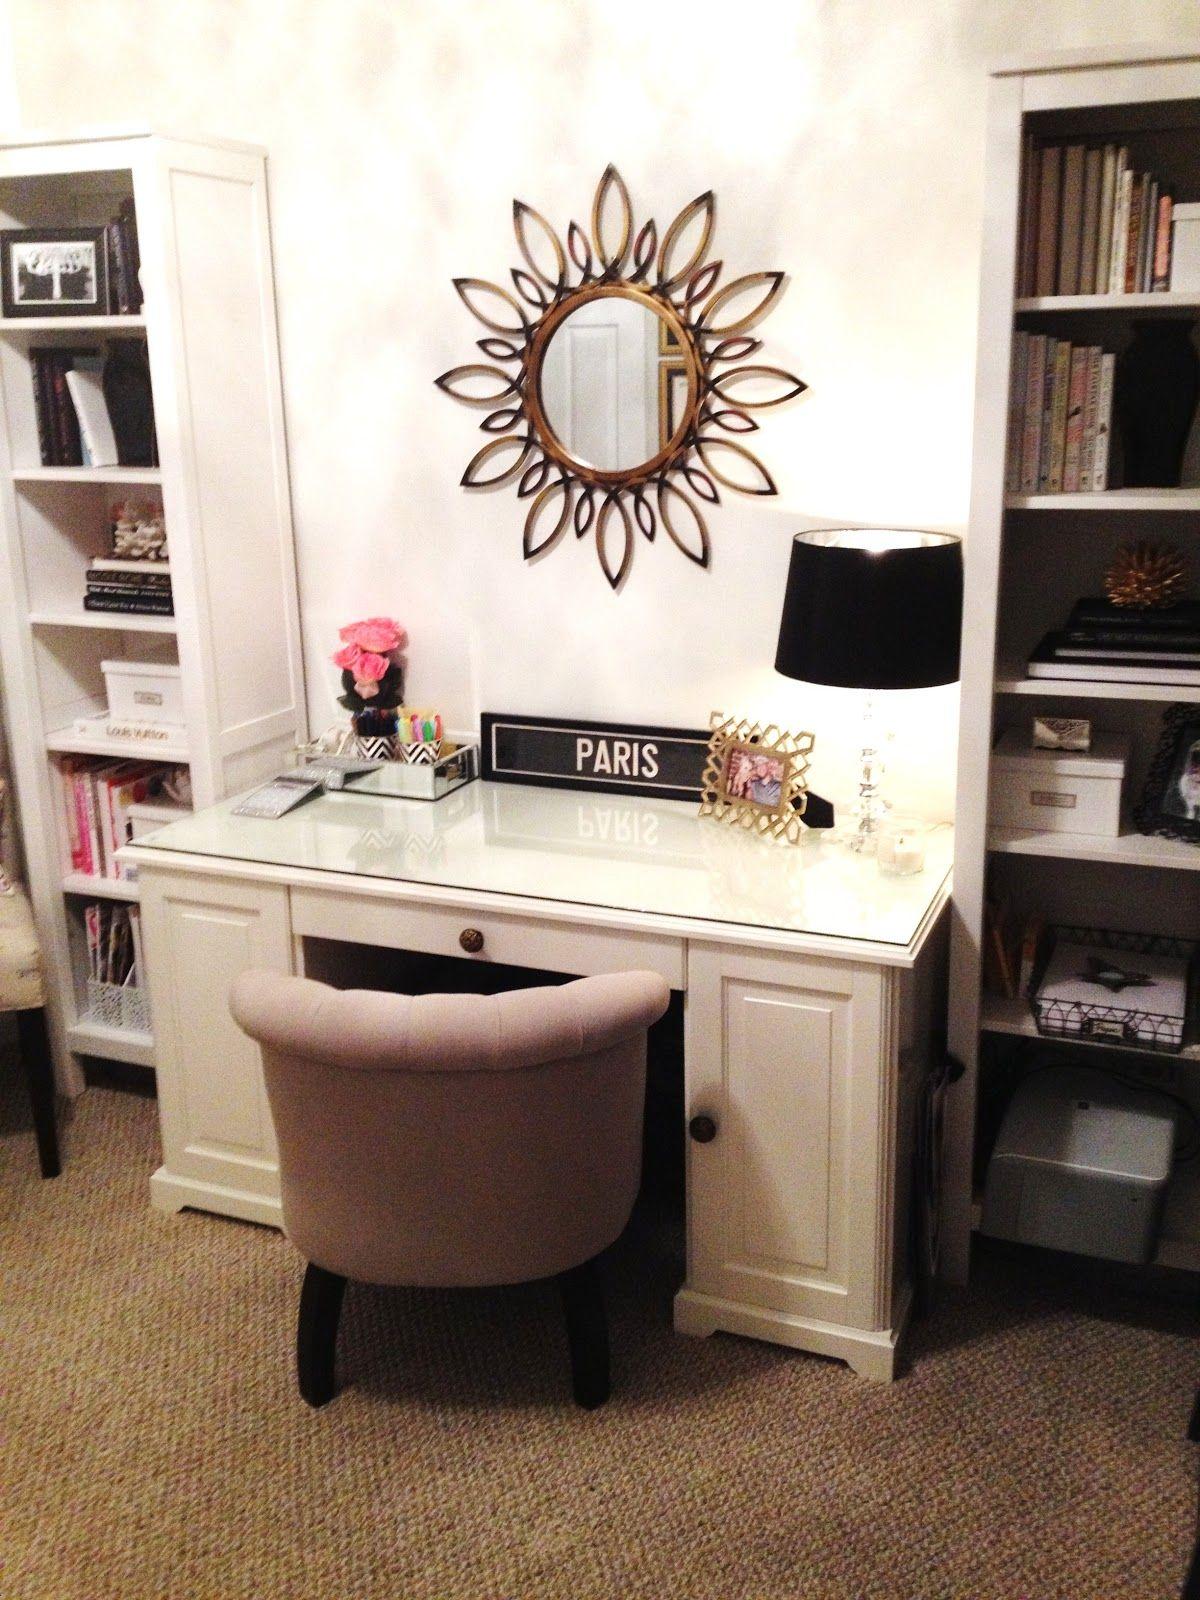 bright + happy office space (via TiffanyD)